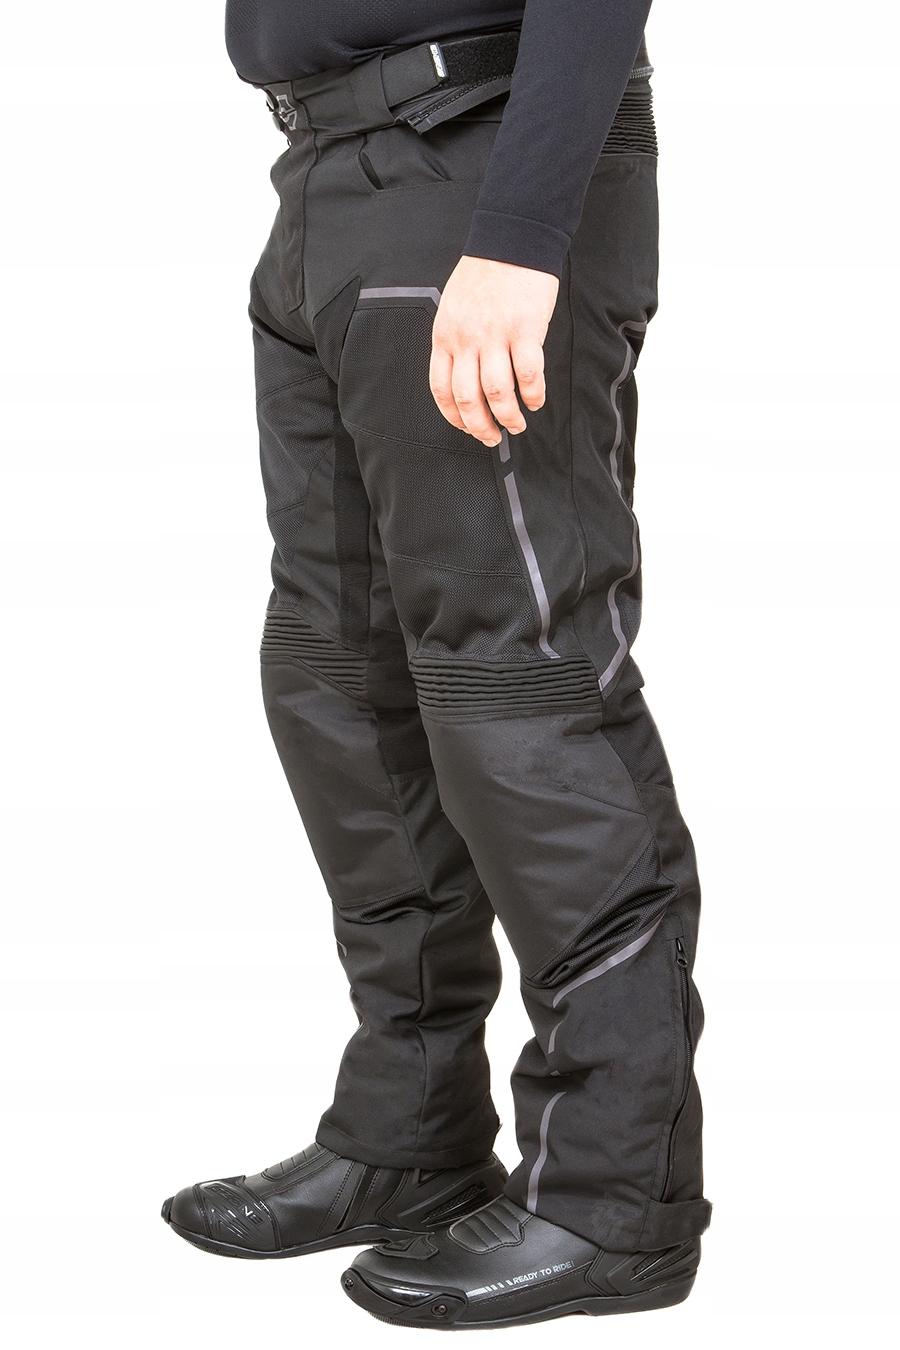 Tesktylne штаны мотоциклетные ozone jet 5xl, фото 7